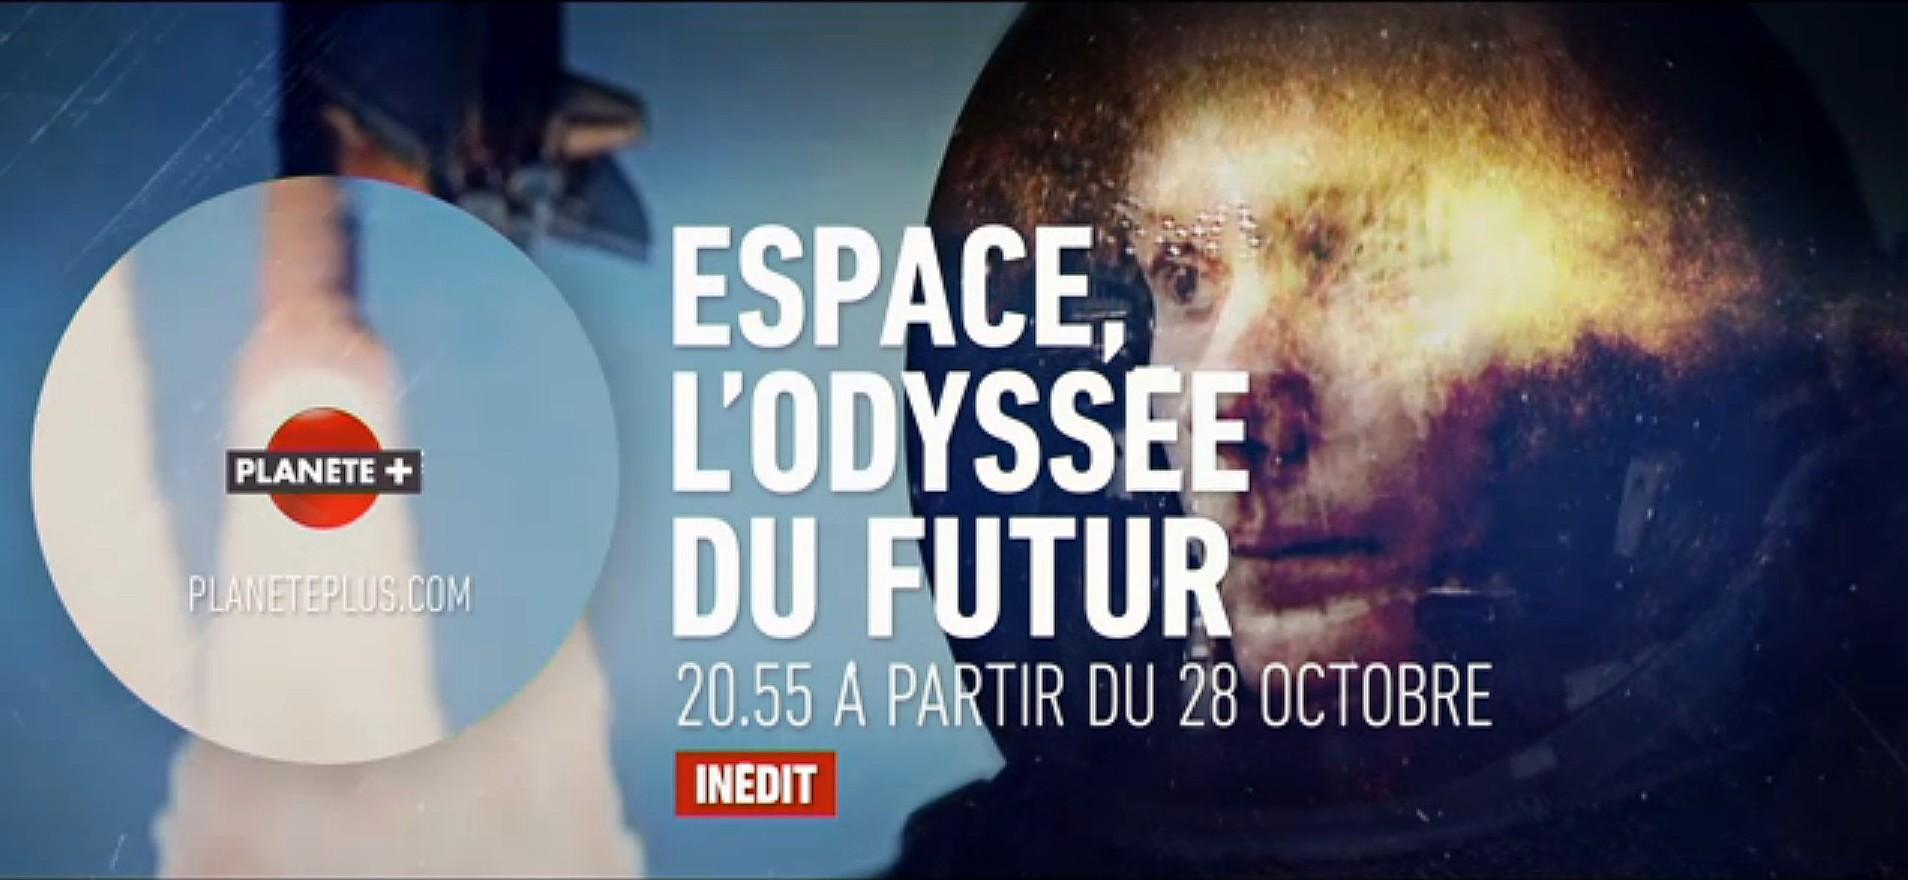 lodyssee-du-futur-grd-format